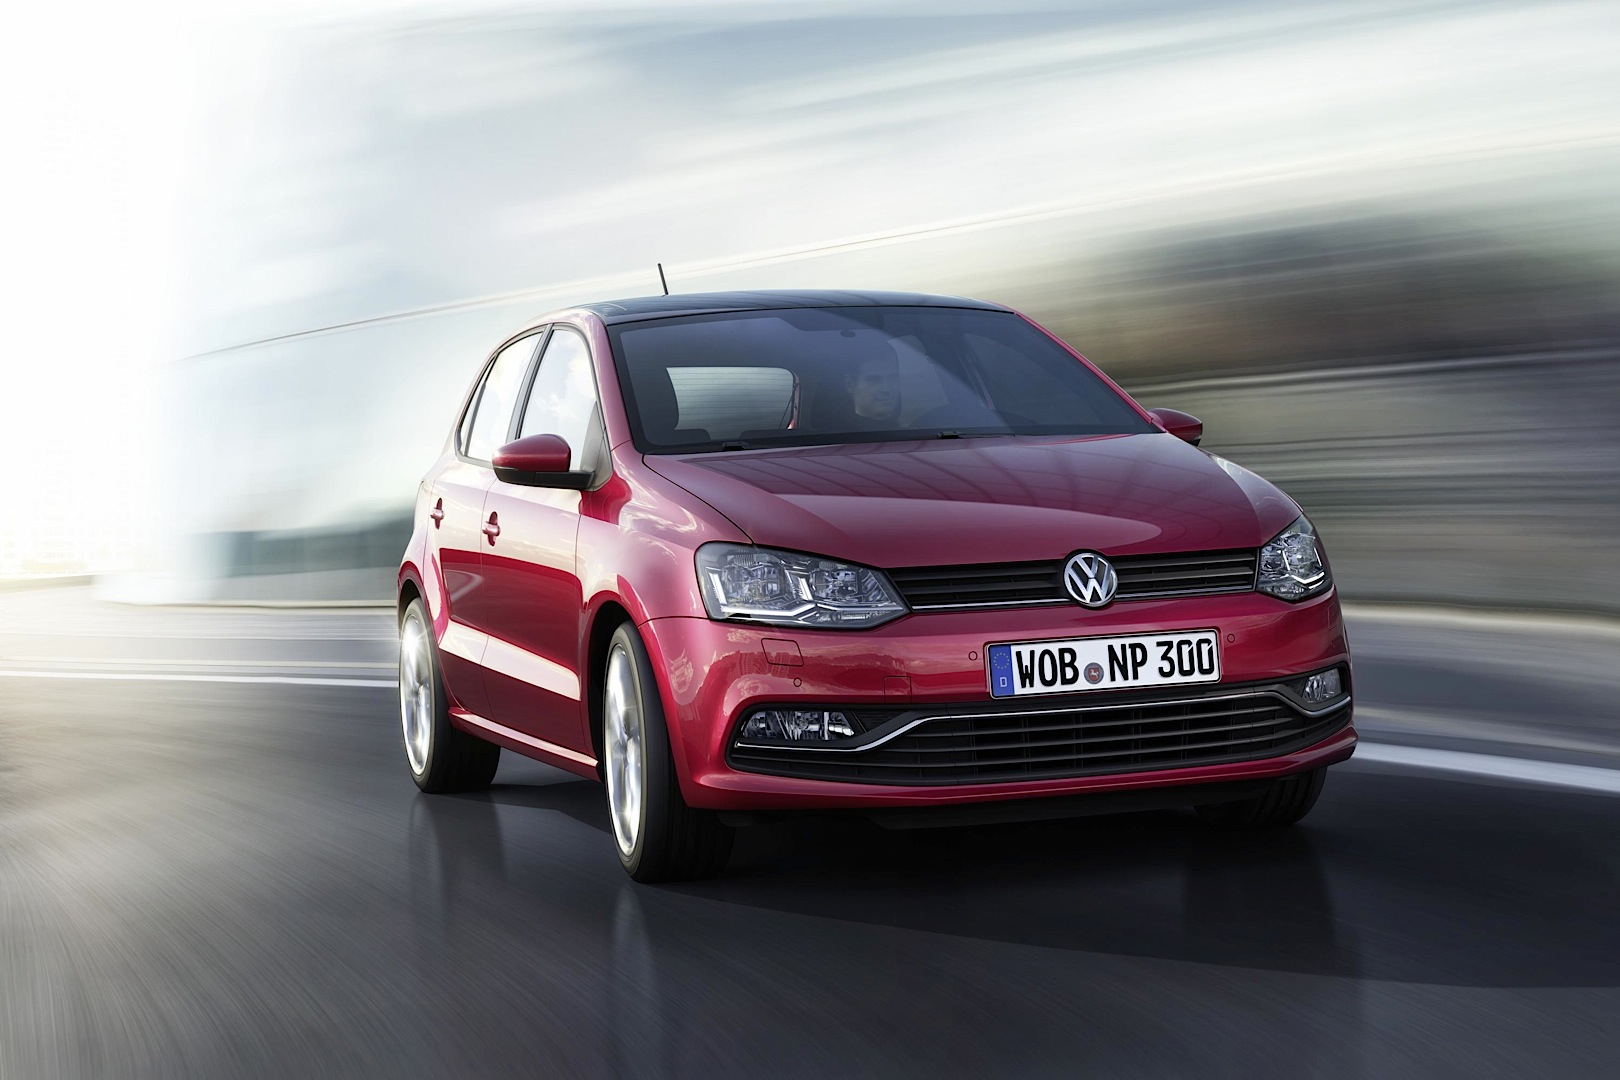 2014 Volkswagen Polo Facelift: Exterior Changes - autoevolution